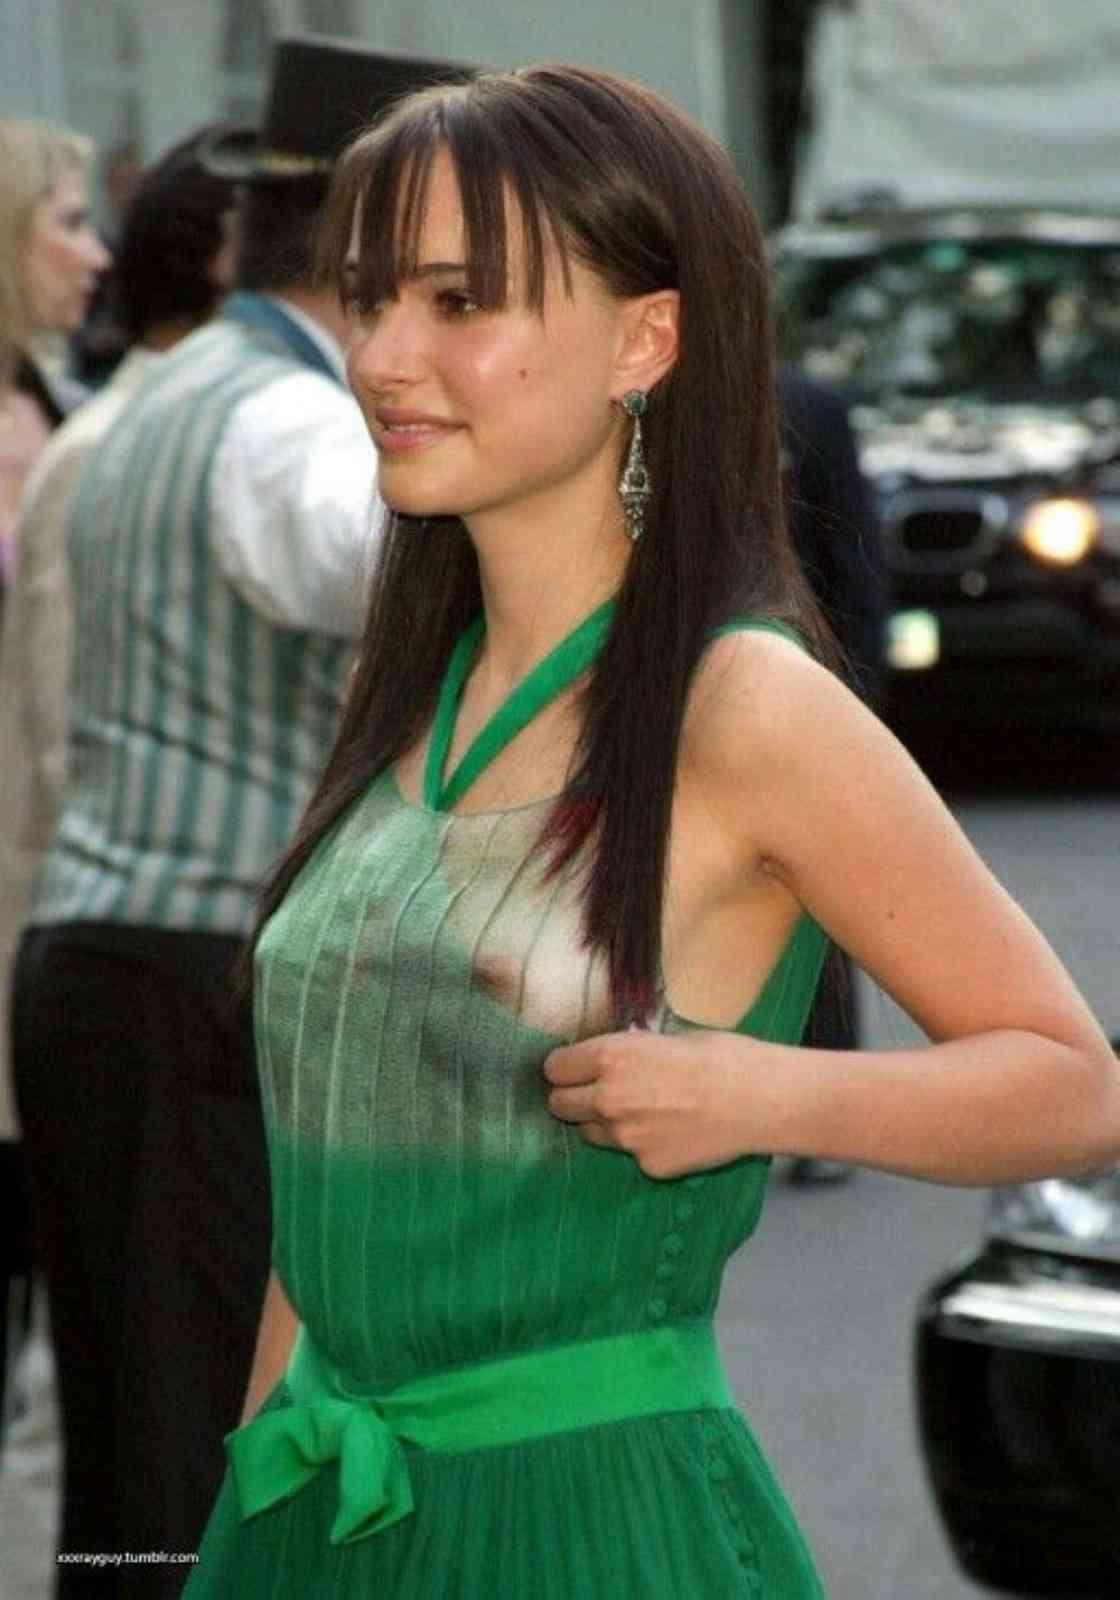 Natalie Portman - breasts